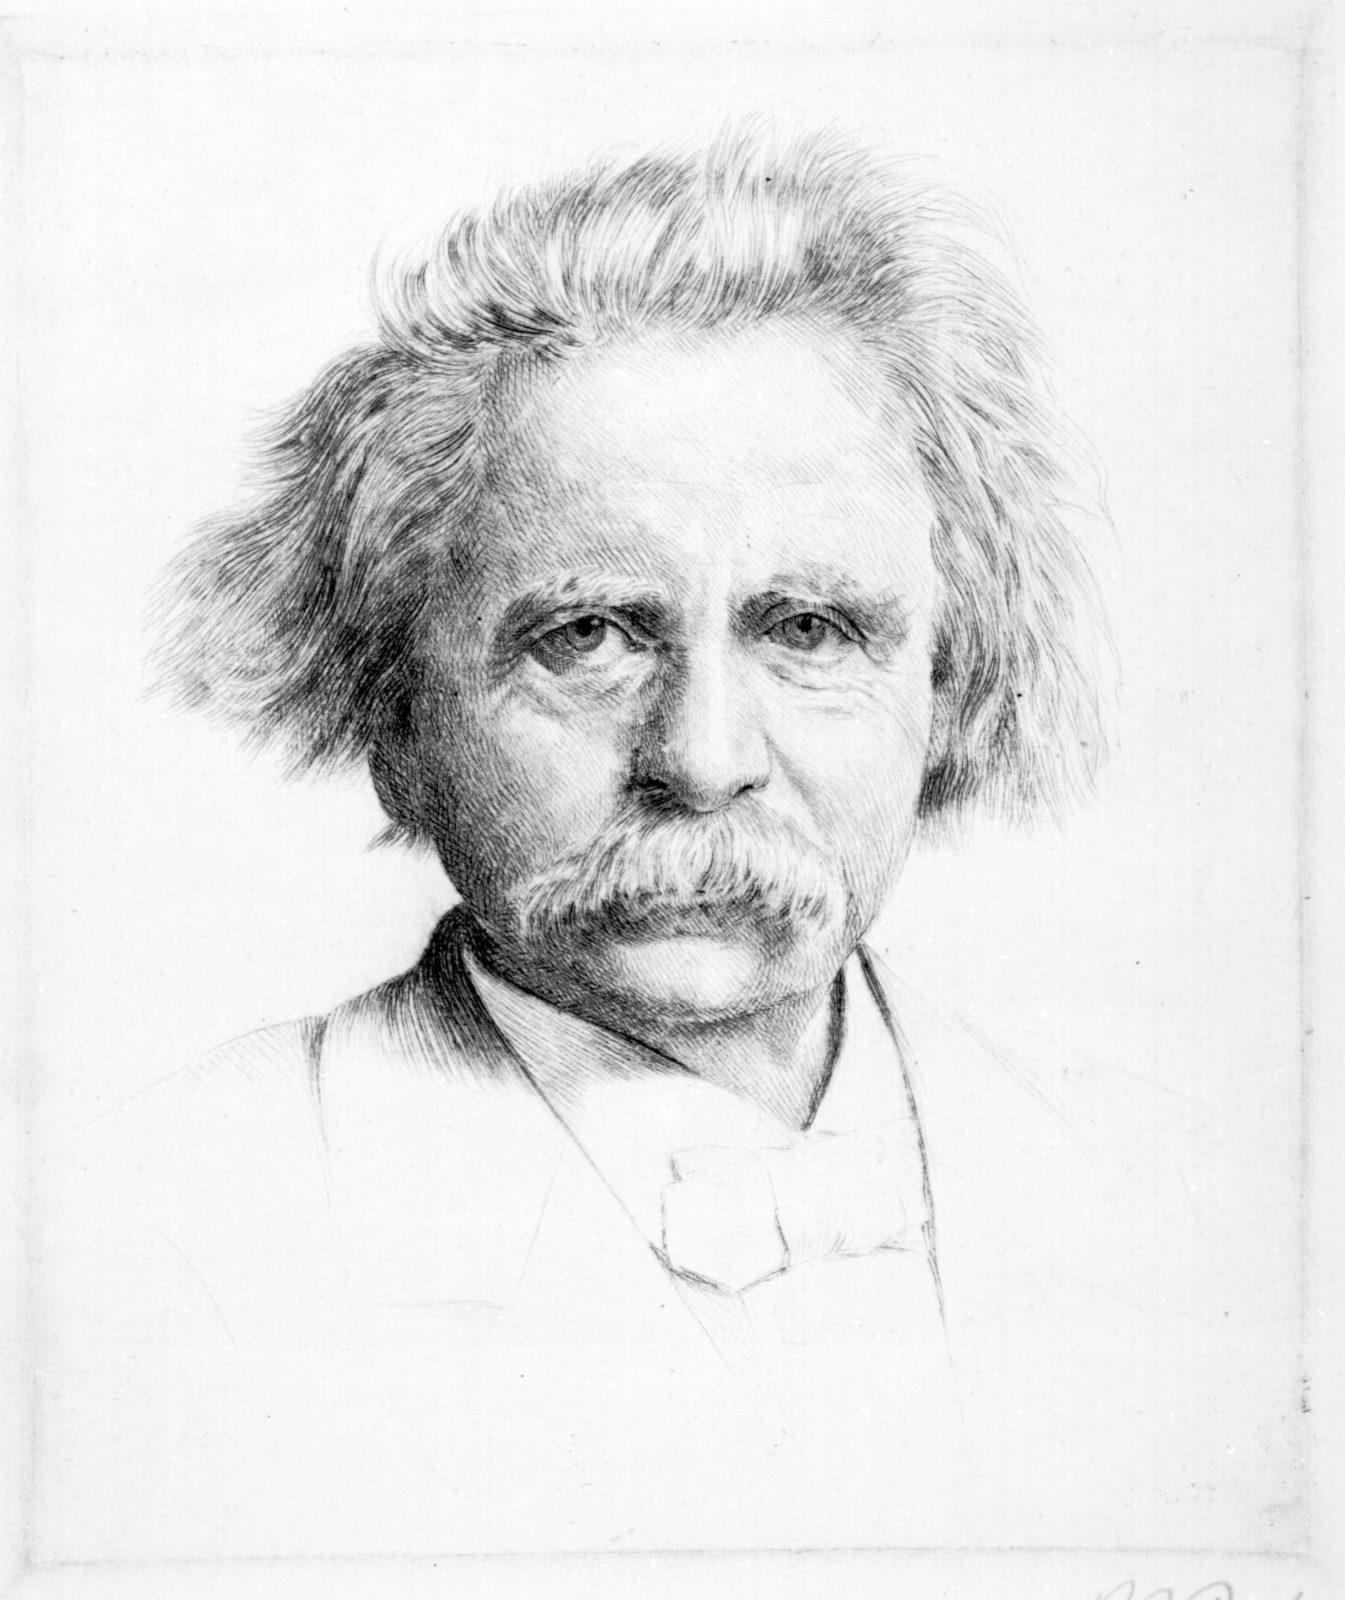 Edvard Grieg drawn portrait